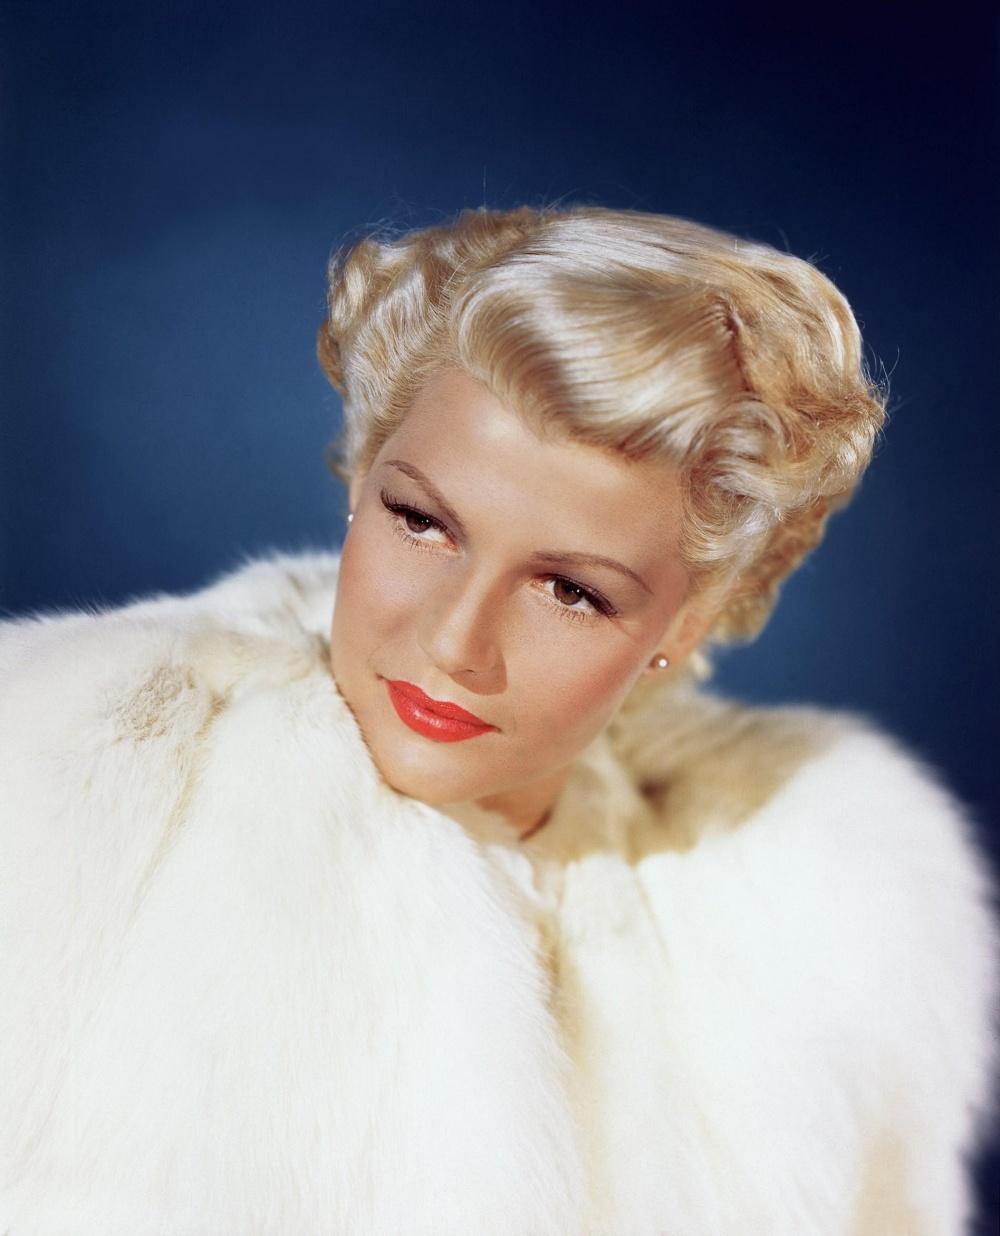 Rita hayworth sexy films